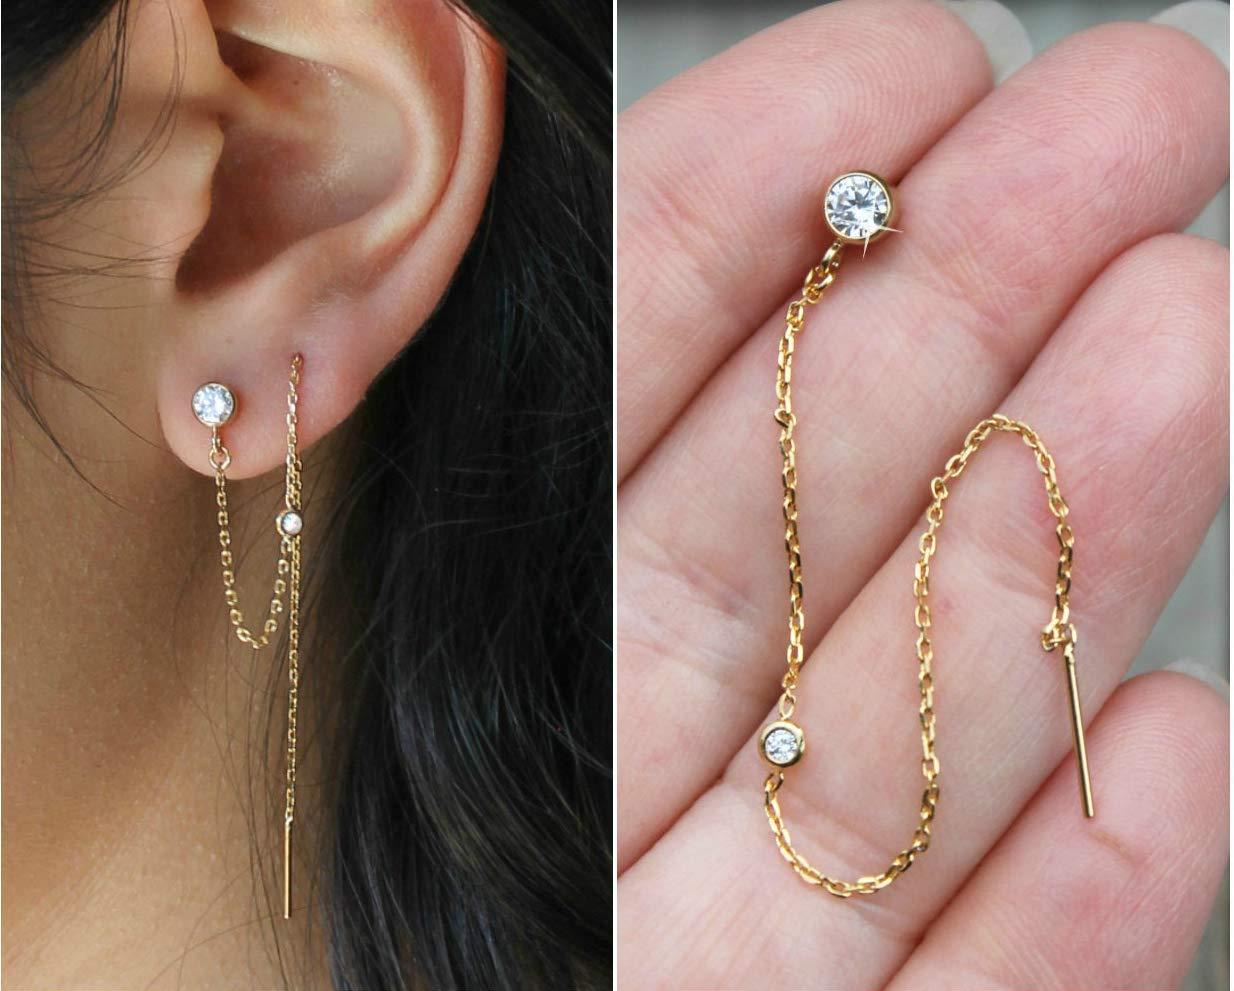 Rose gold cubic zirconia threader earrings threader earrings cubic zirconia earrings